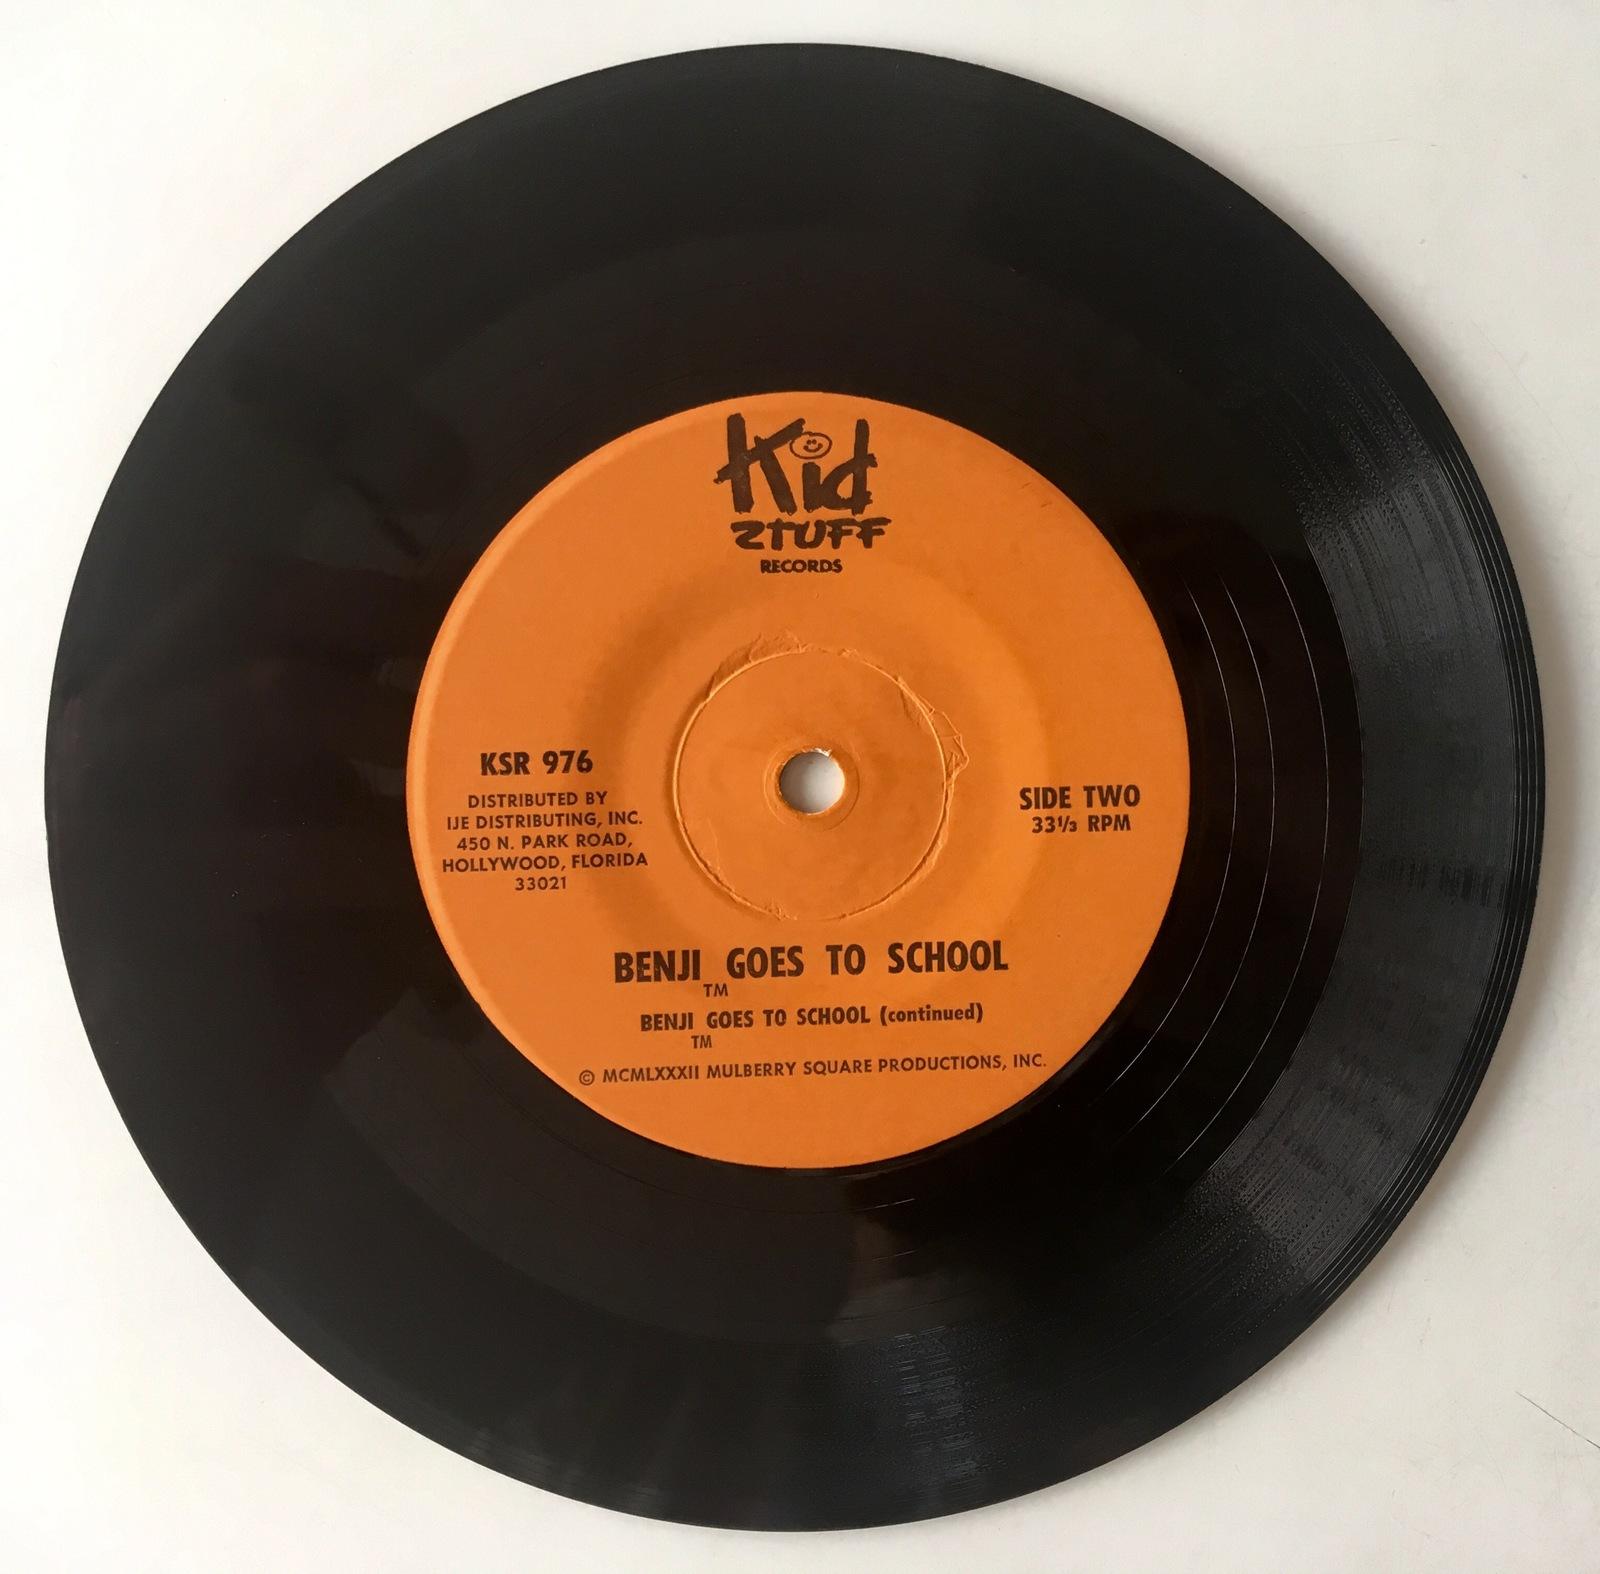 Benji Goes To School 7' Vinyl Record /  Book, KSR 976, 1982